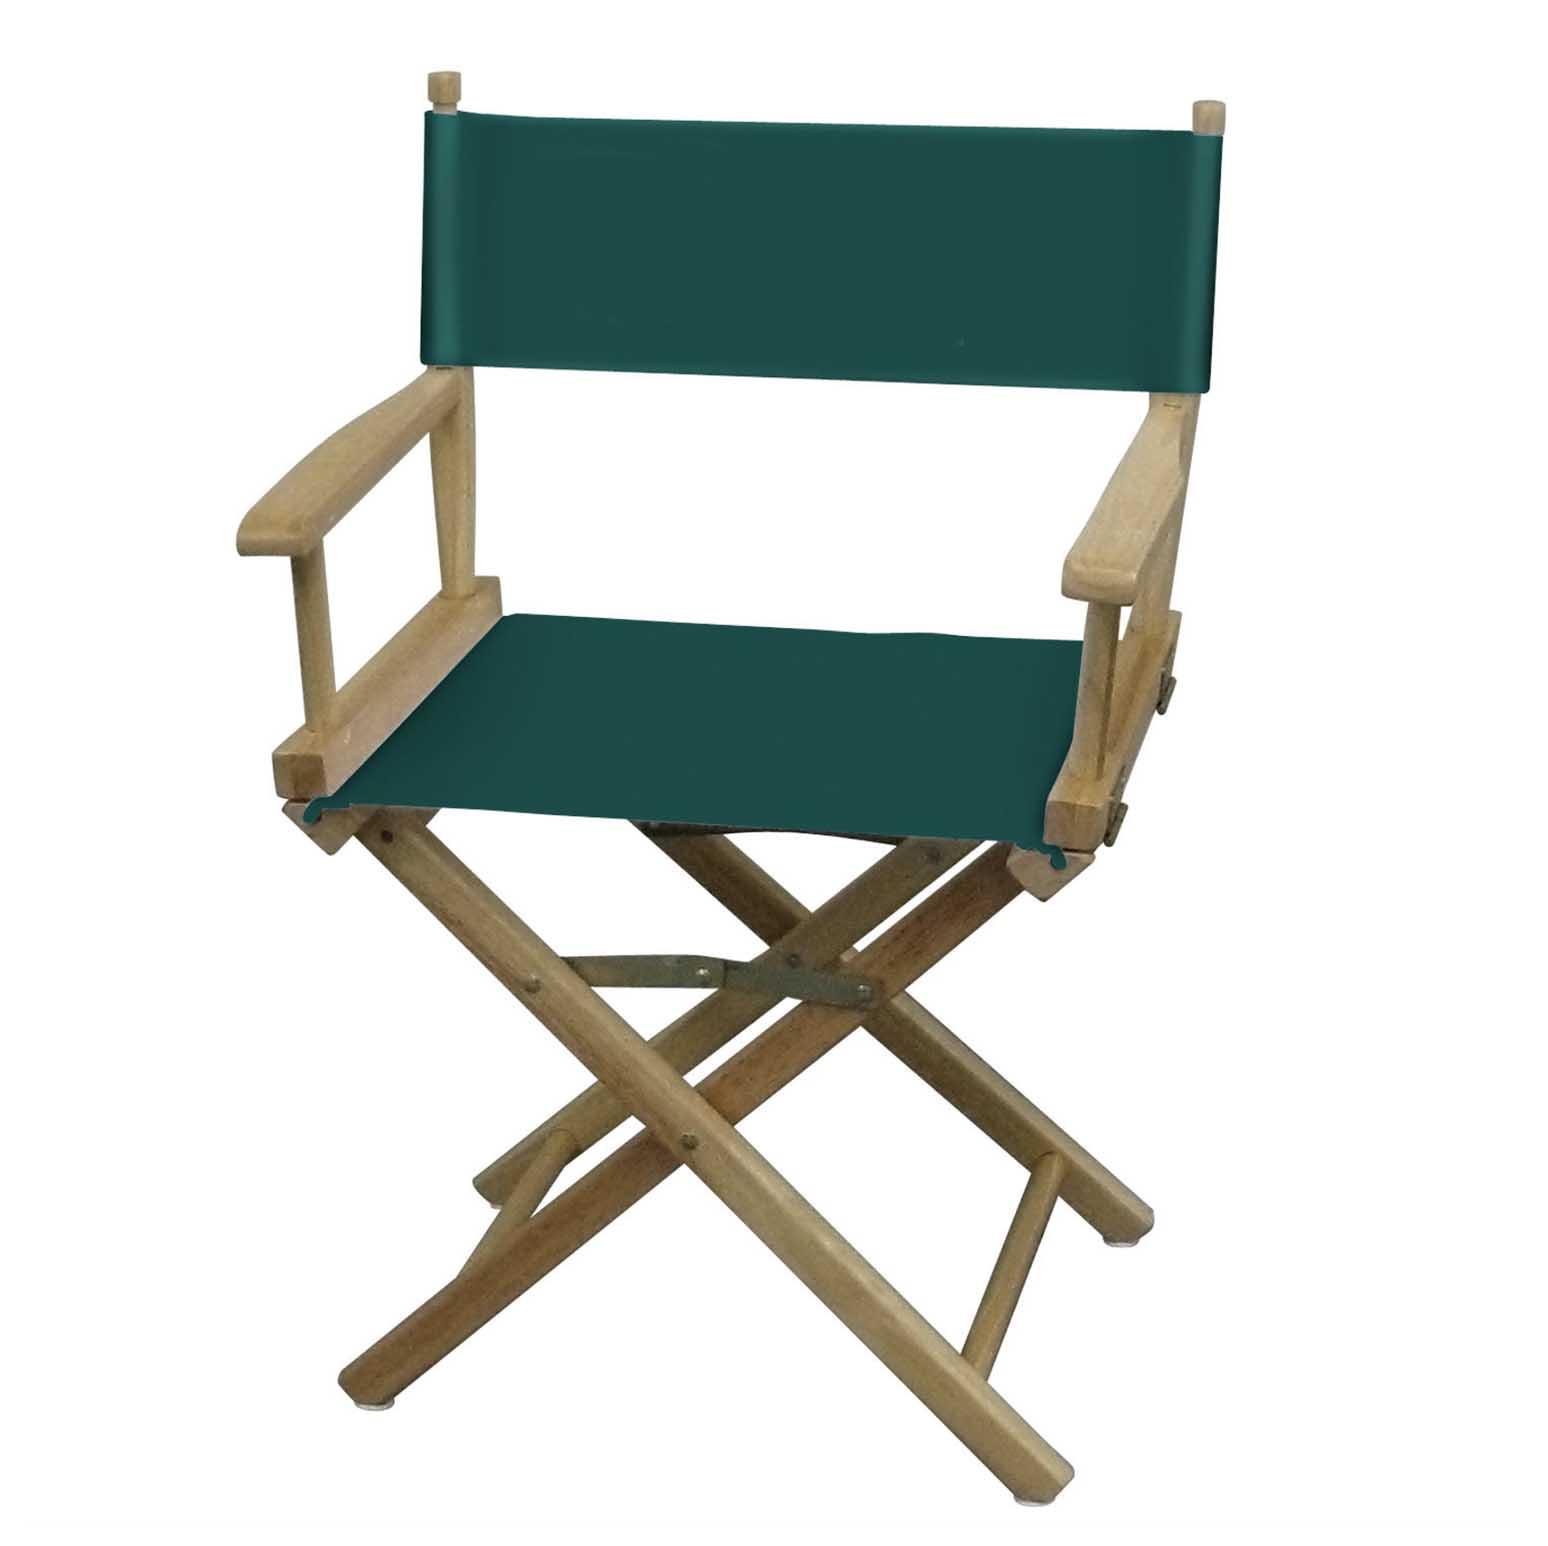 Green directors chair